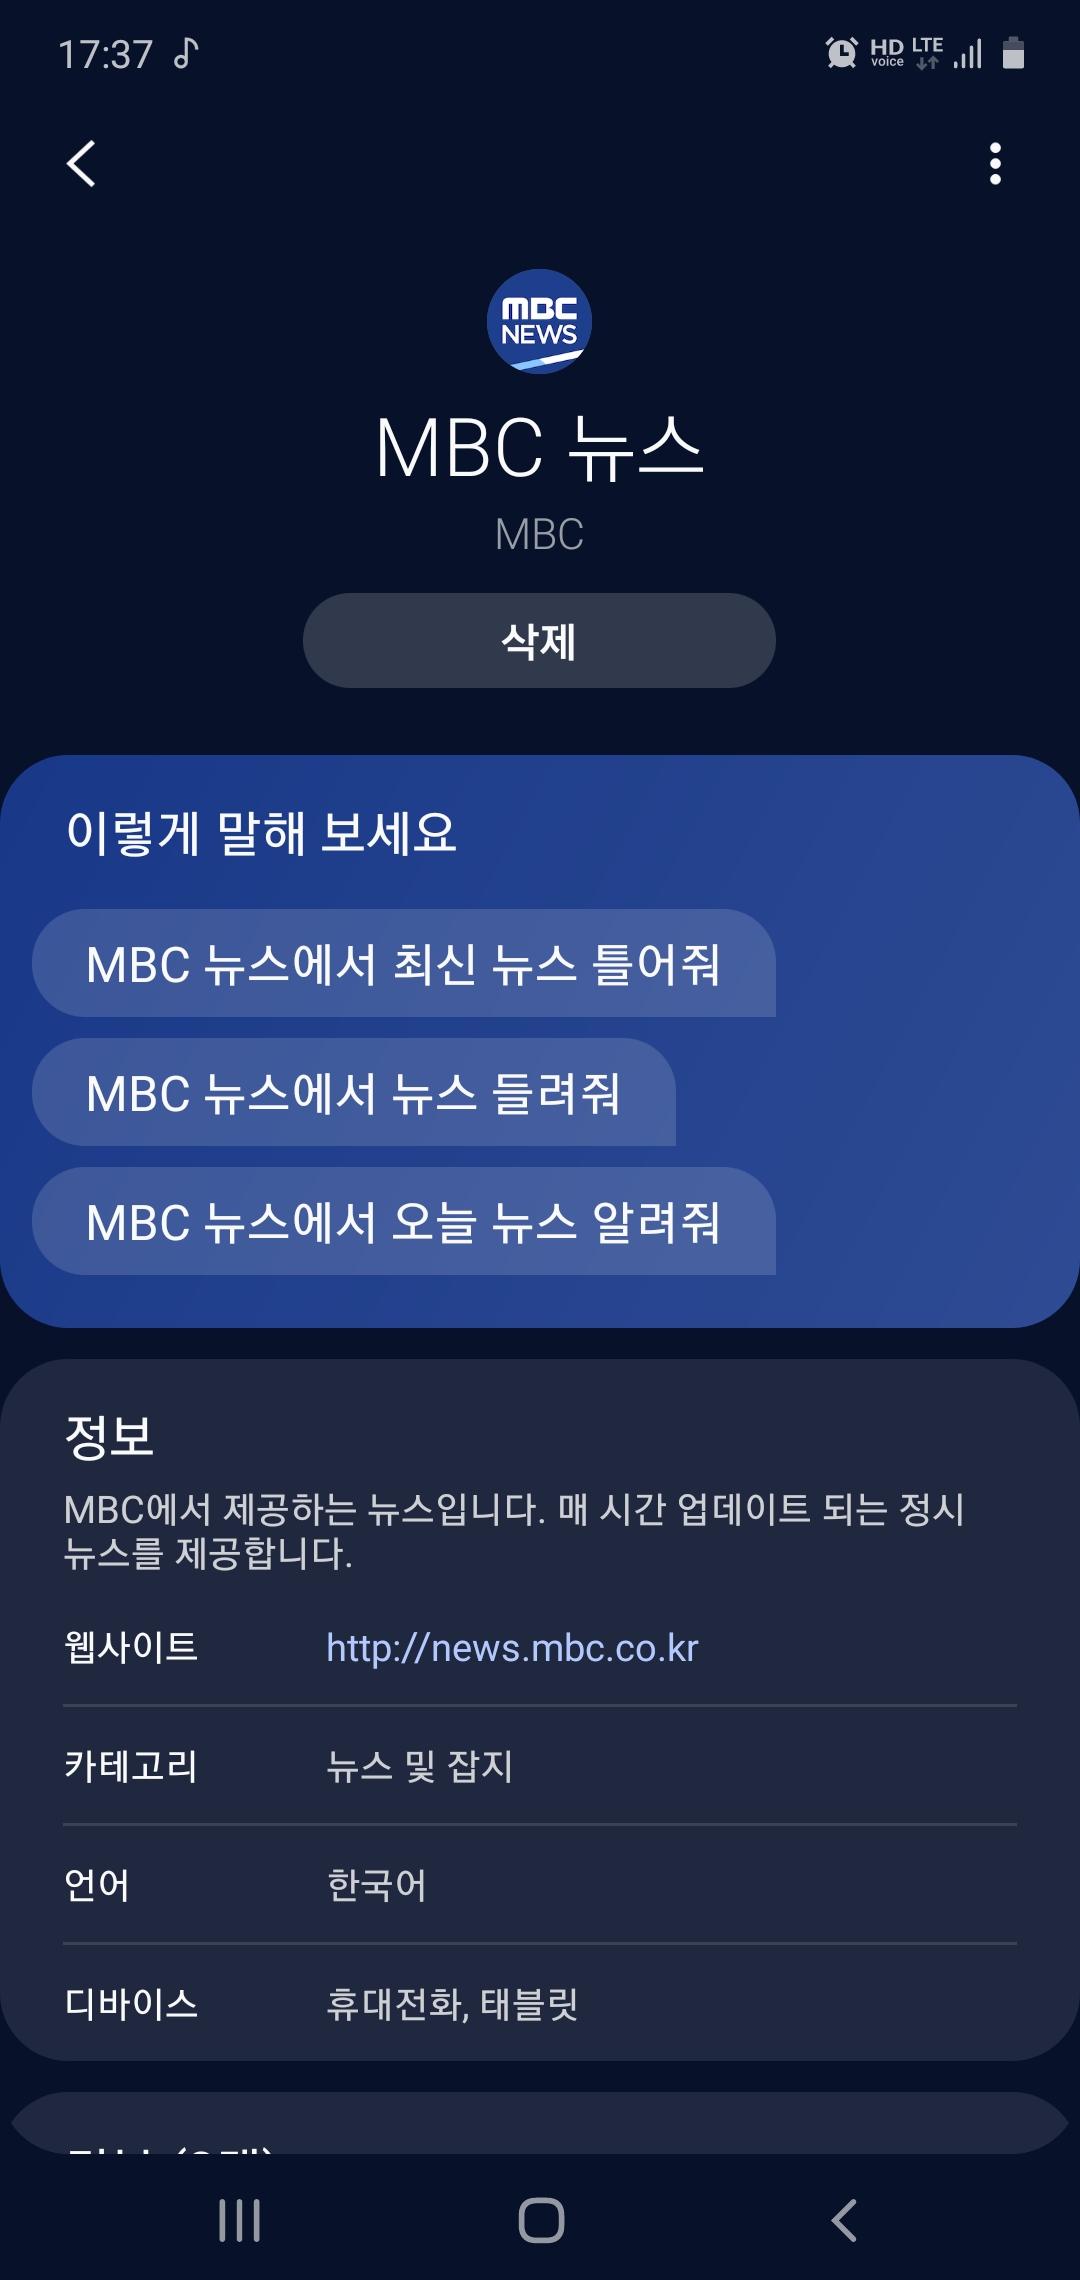 mb-file.php?path=2020%2F10%2F27%2FF3375_MBC%EB%89%B4%EC%8A%A4.jpg